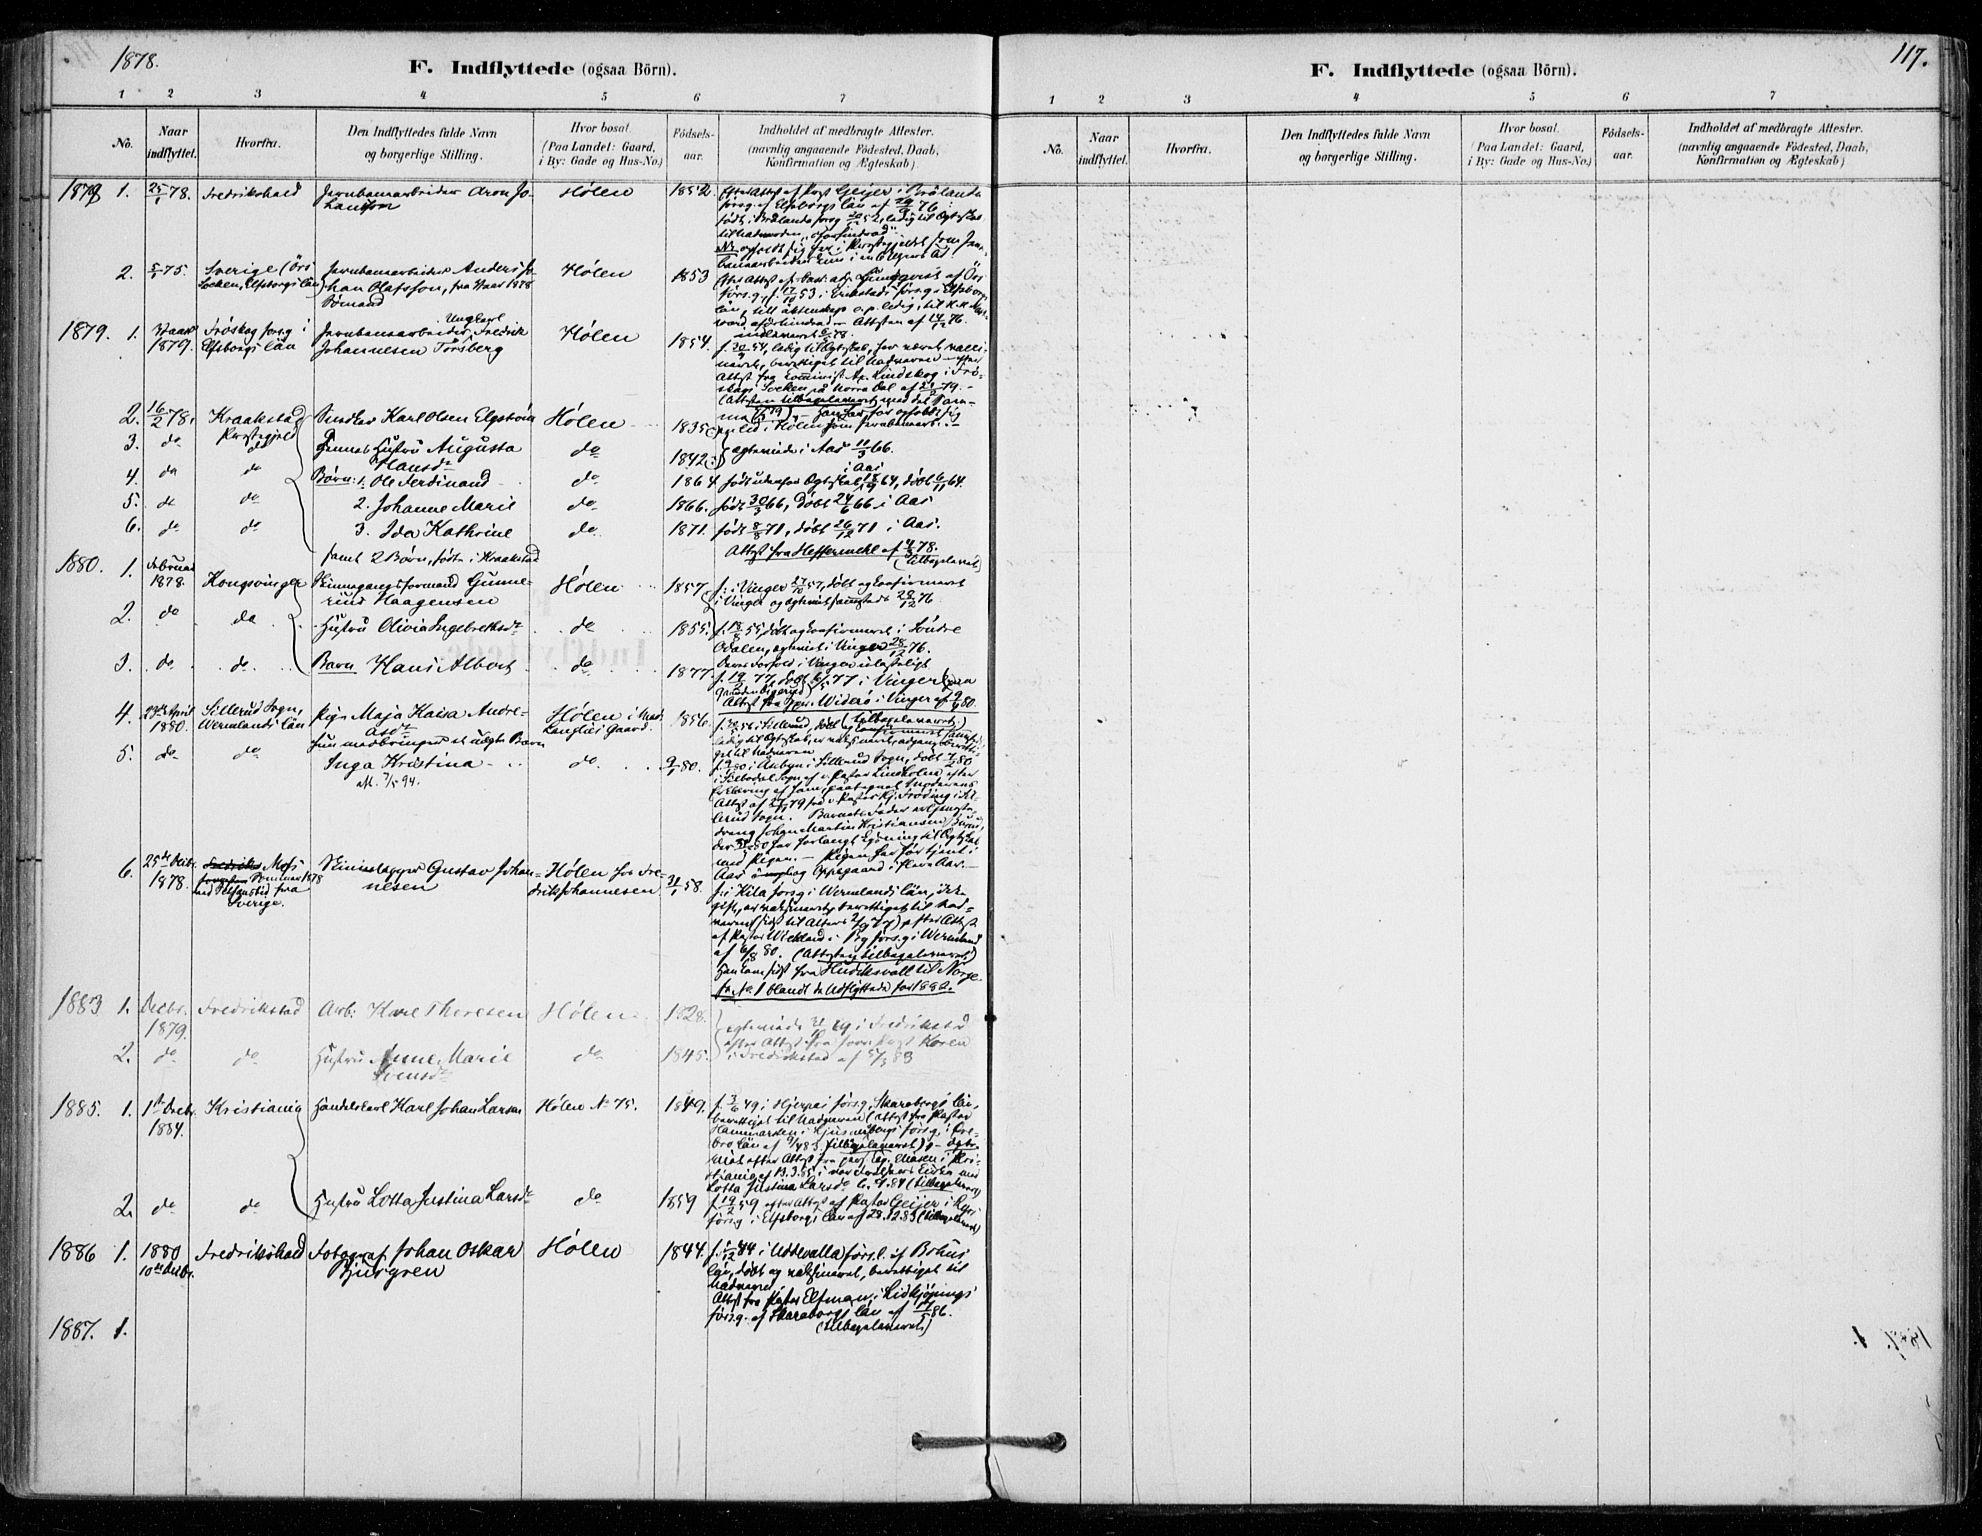 SAO, Vestby prestekontor Kirkebøker, F/Fe/L0001: Ministerialbok nr. V 1, 1878-1931, s. 117